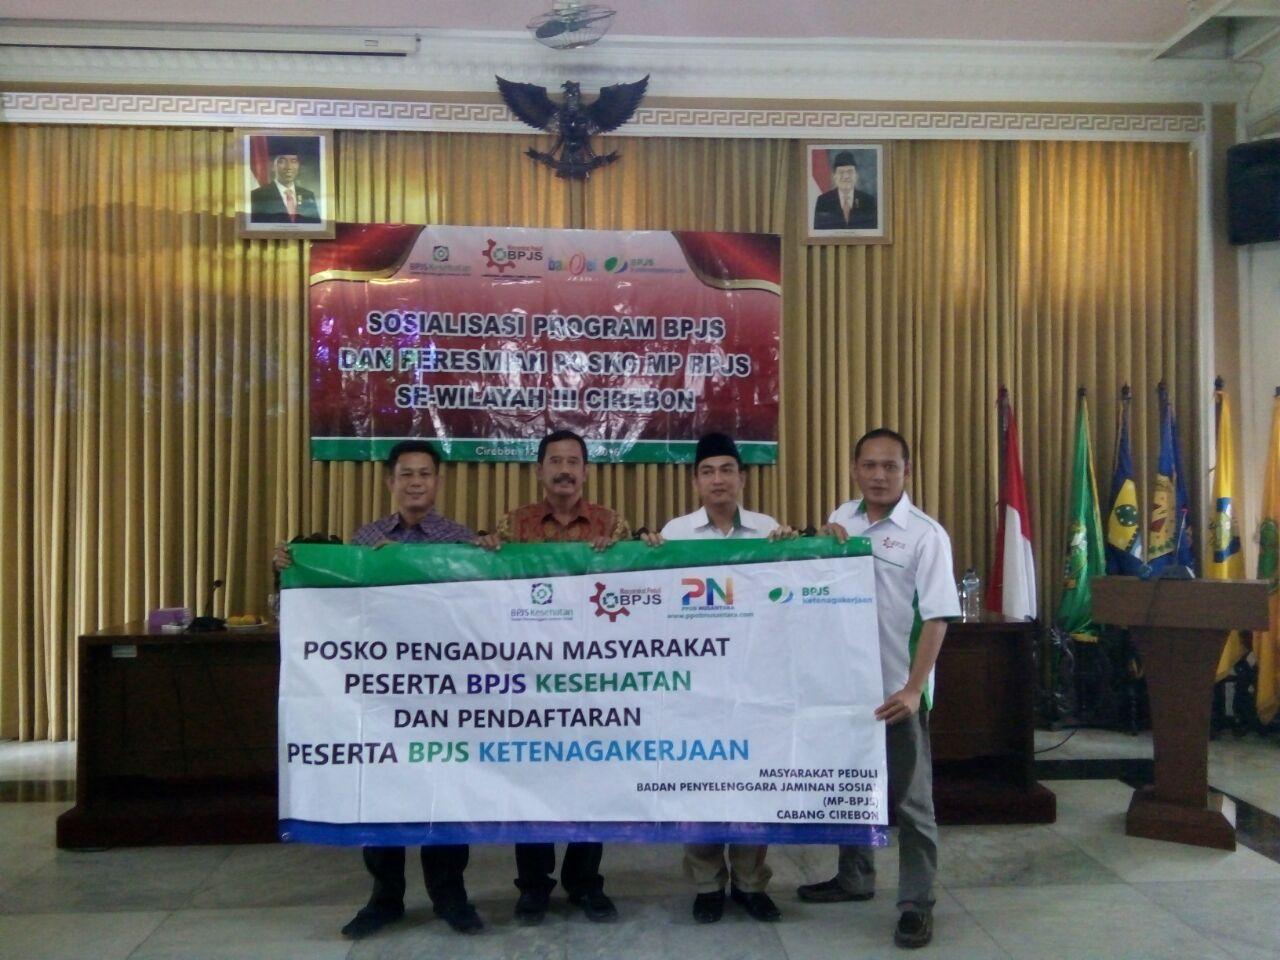 Foto : MPBPJS Cirebon